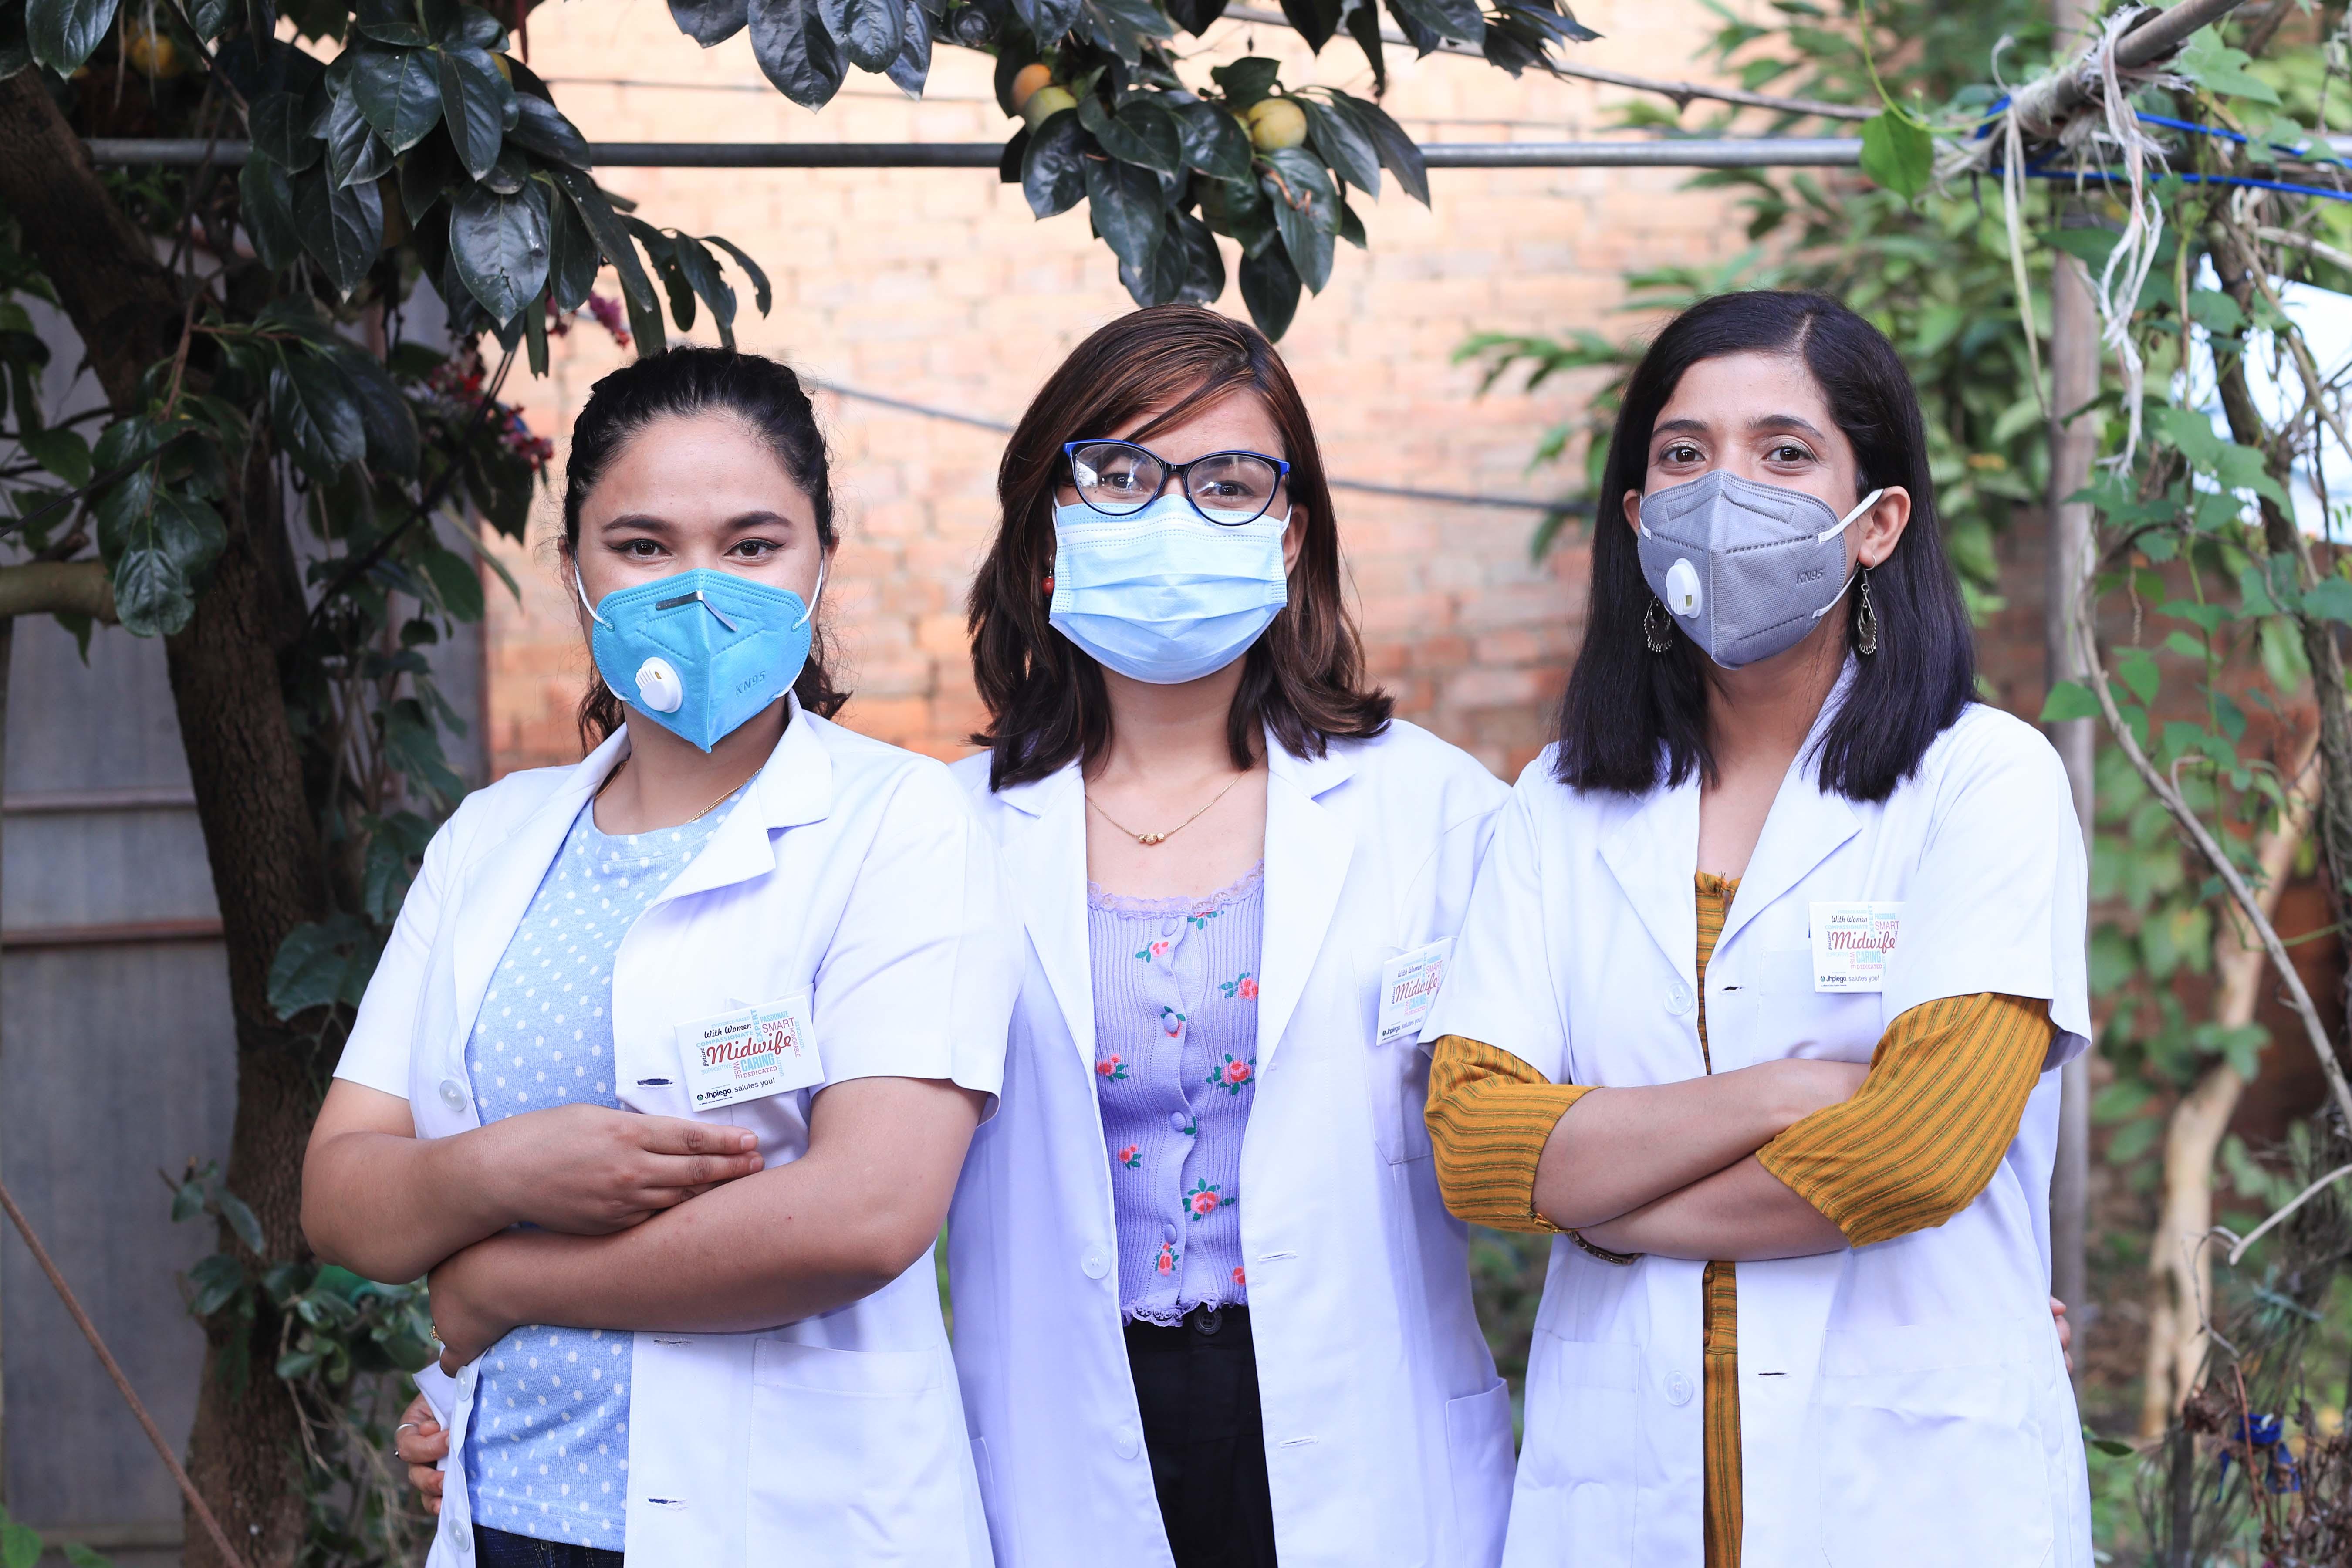 Registered midwife Telemidwifery service provider